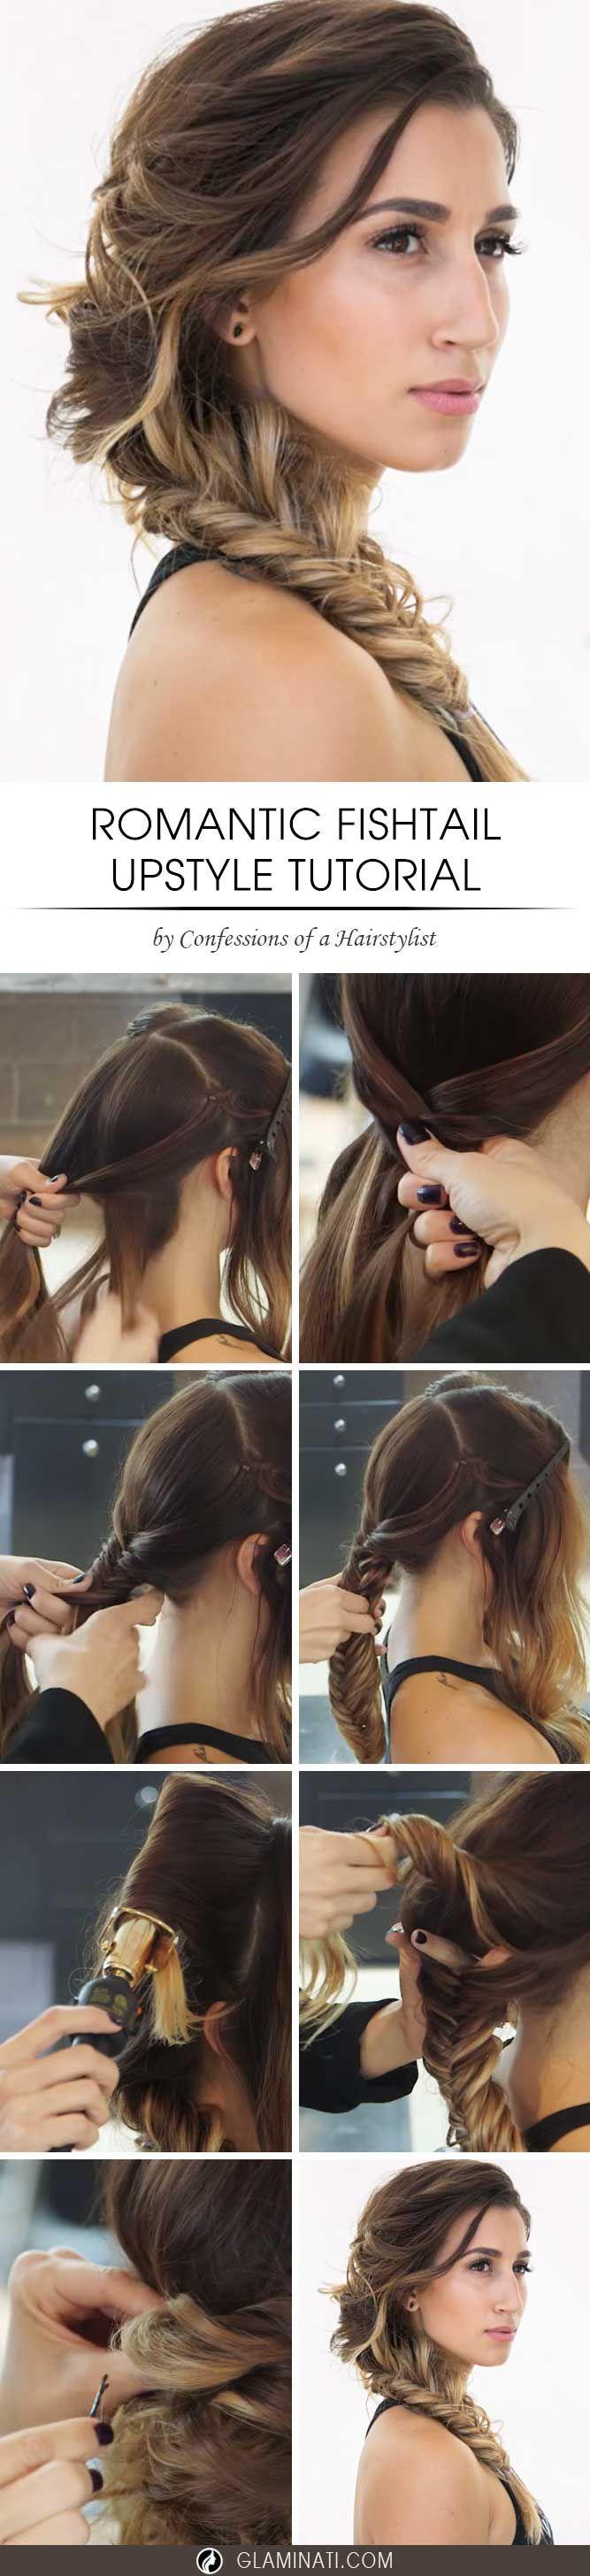 Hair howto romantic side fishtail braid upstyle wedding